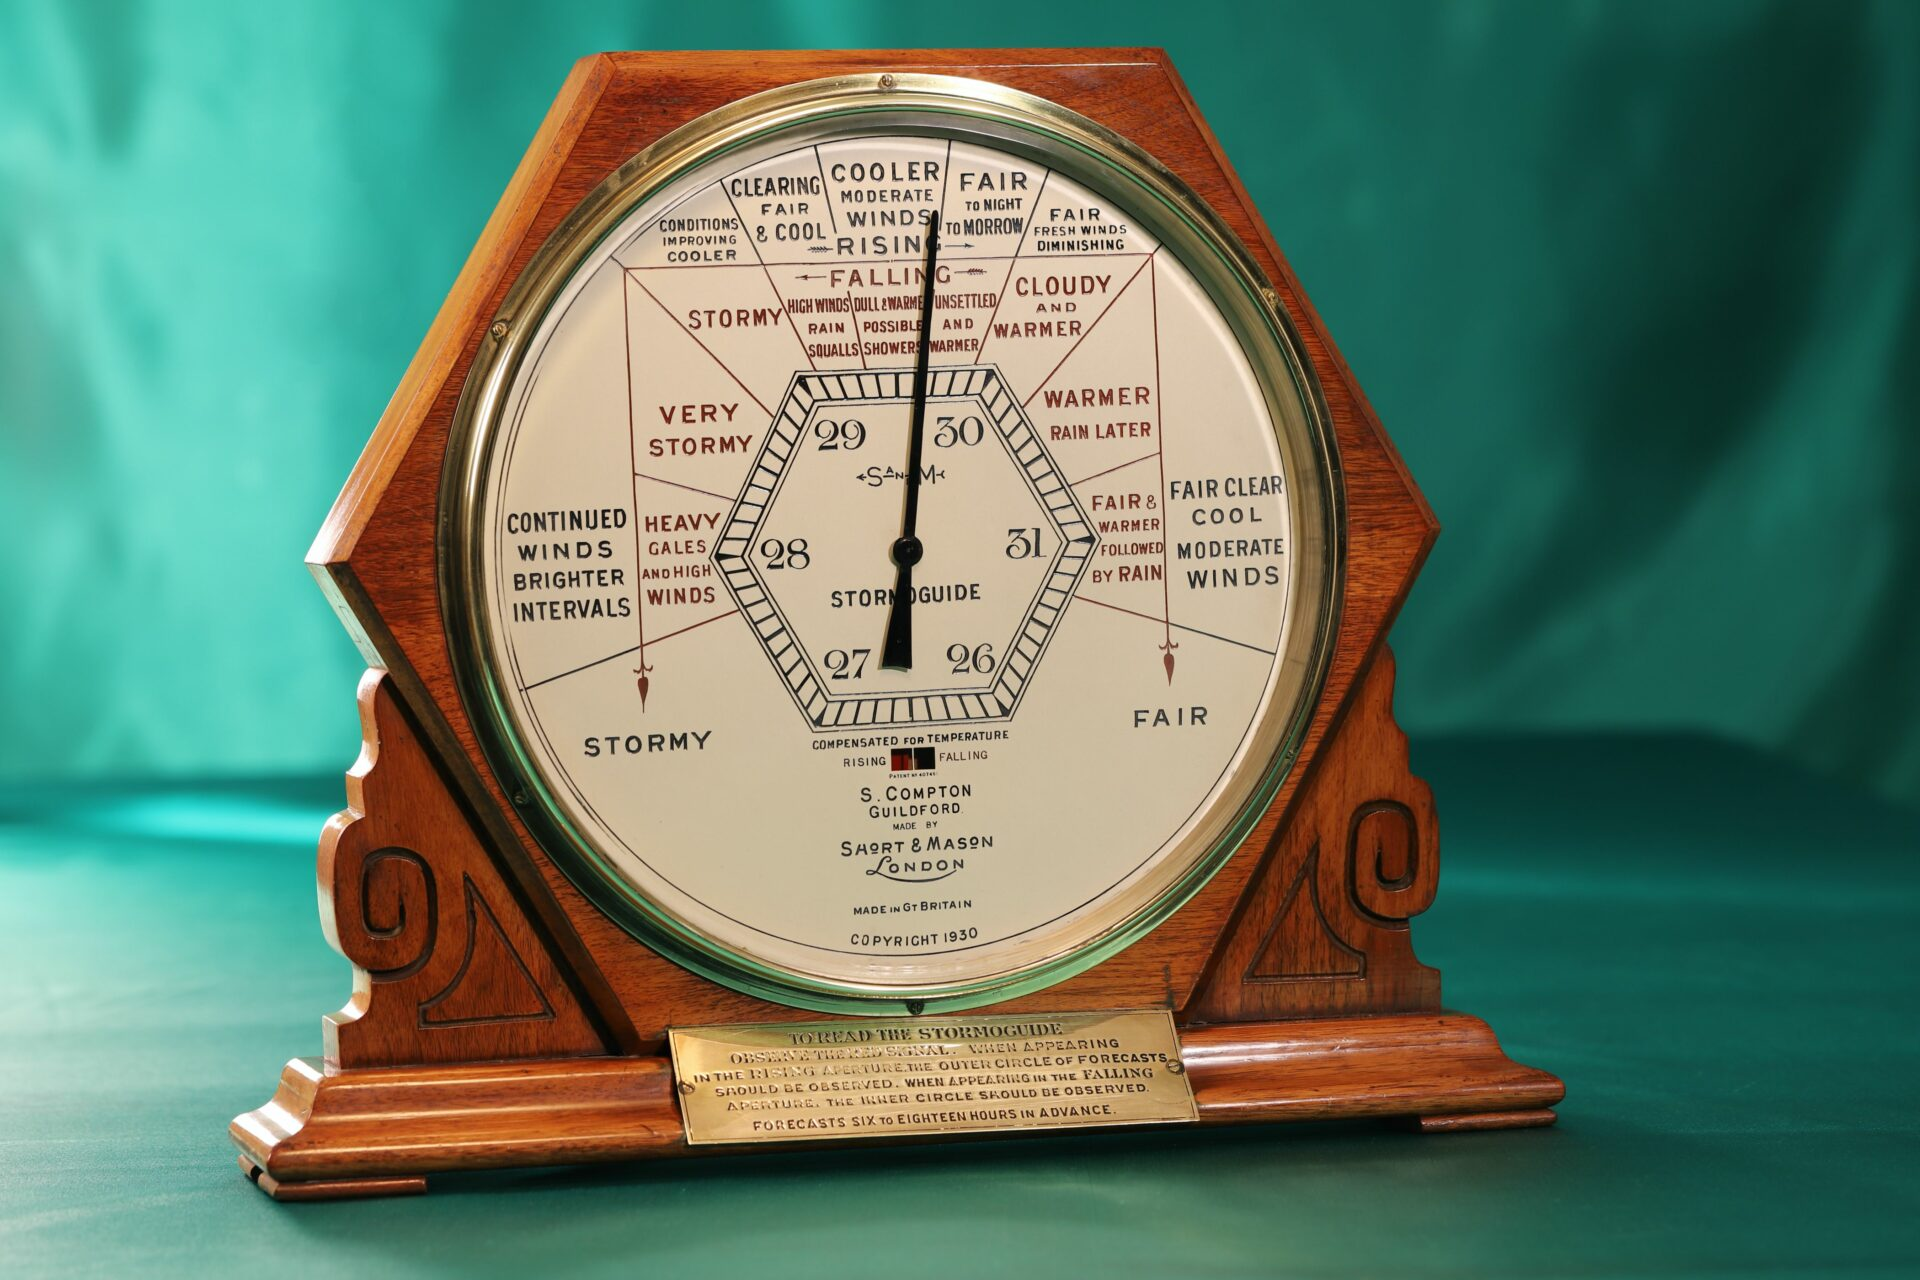 Image of Short & Mason Hexagonal Stormoguide Barometer c1935 taken from front left